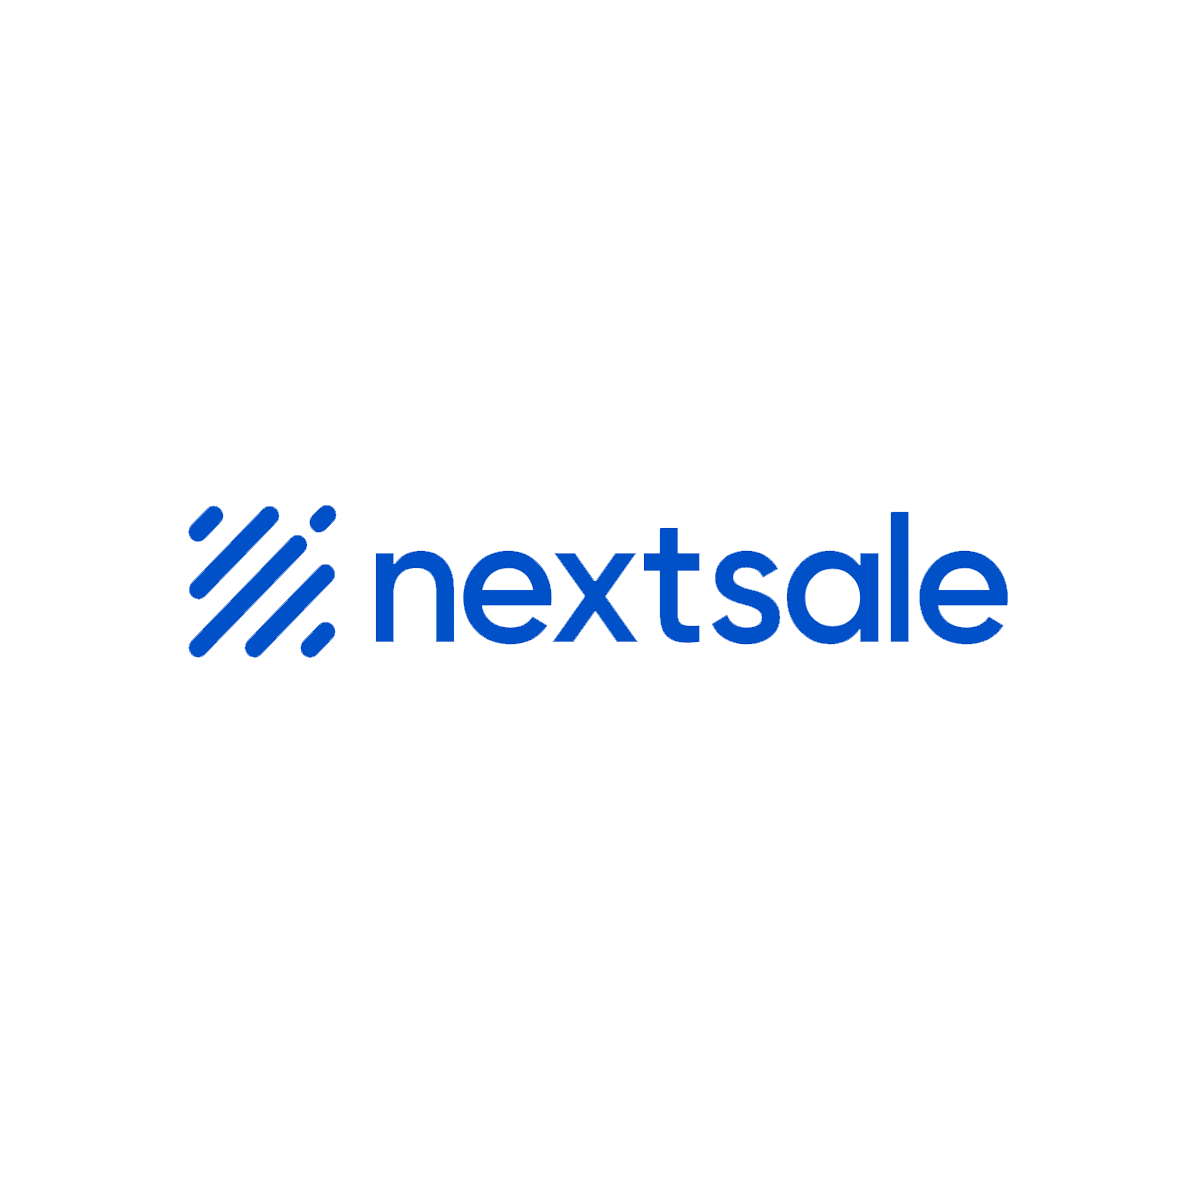 Nextsale